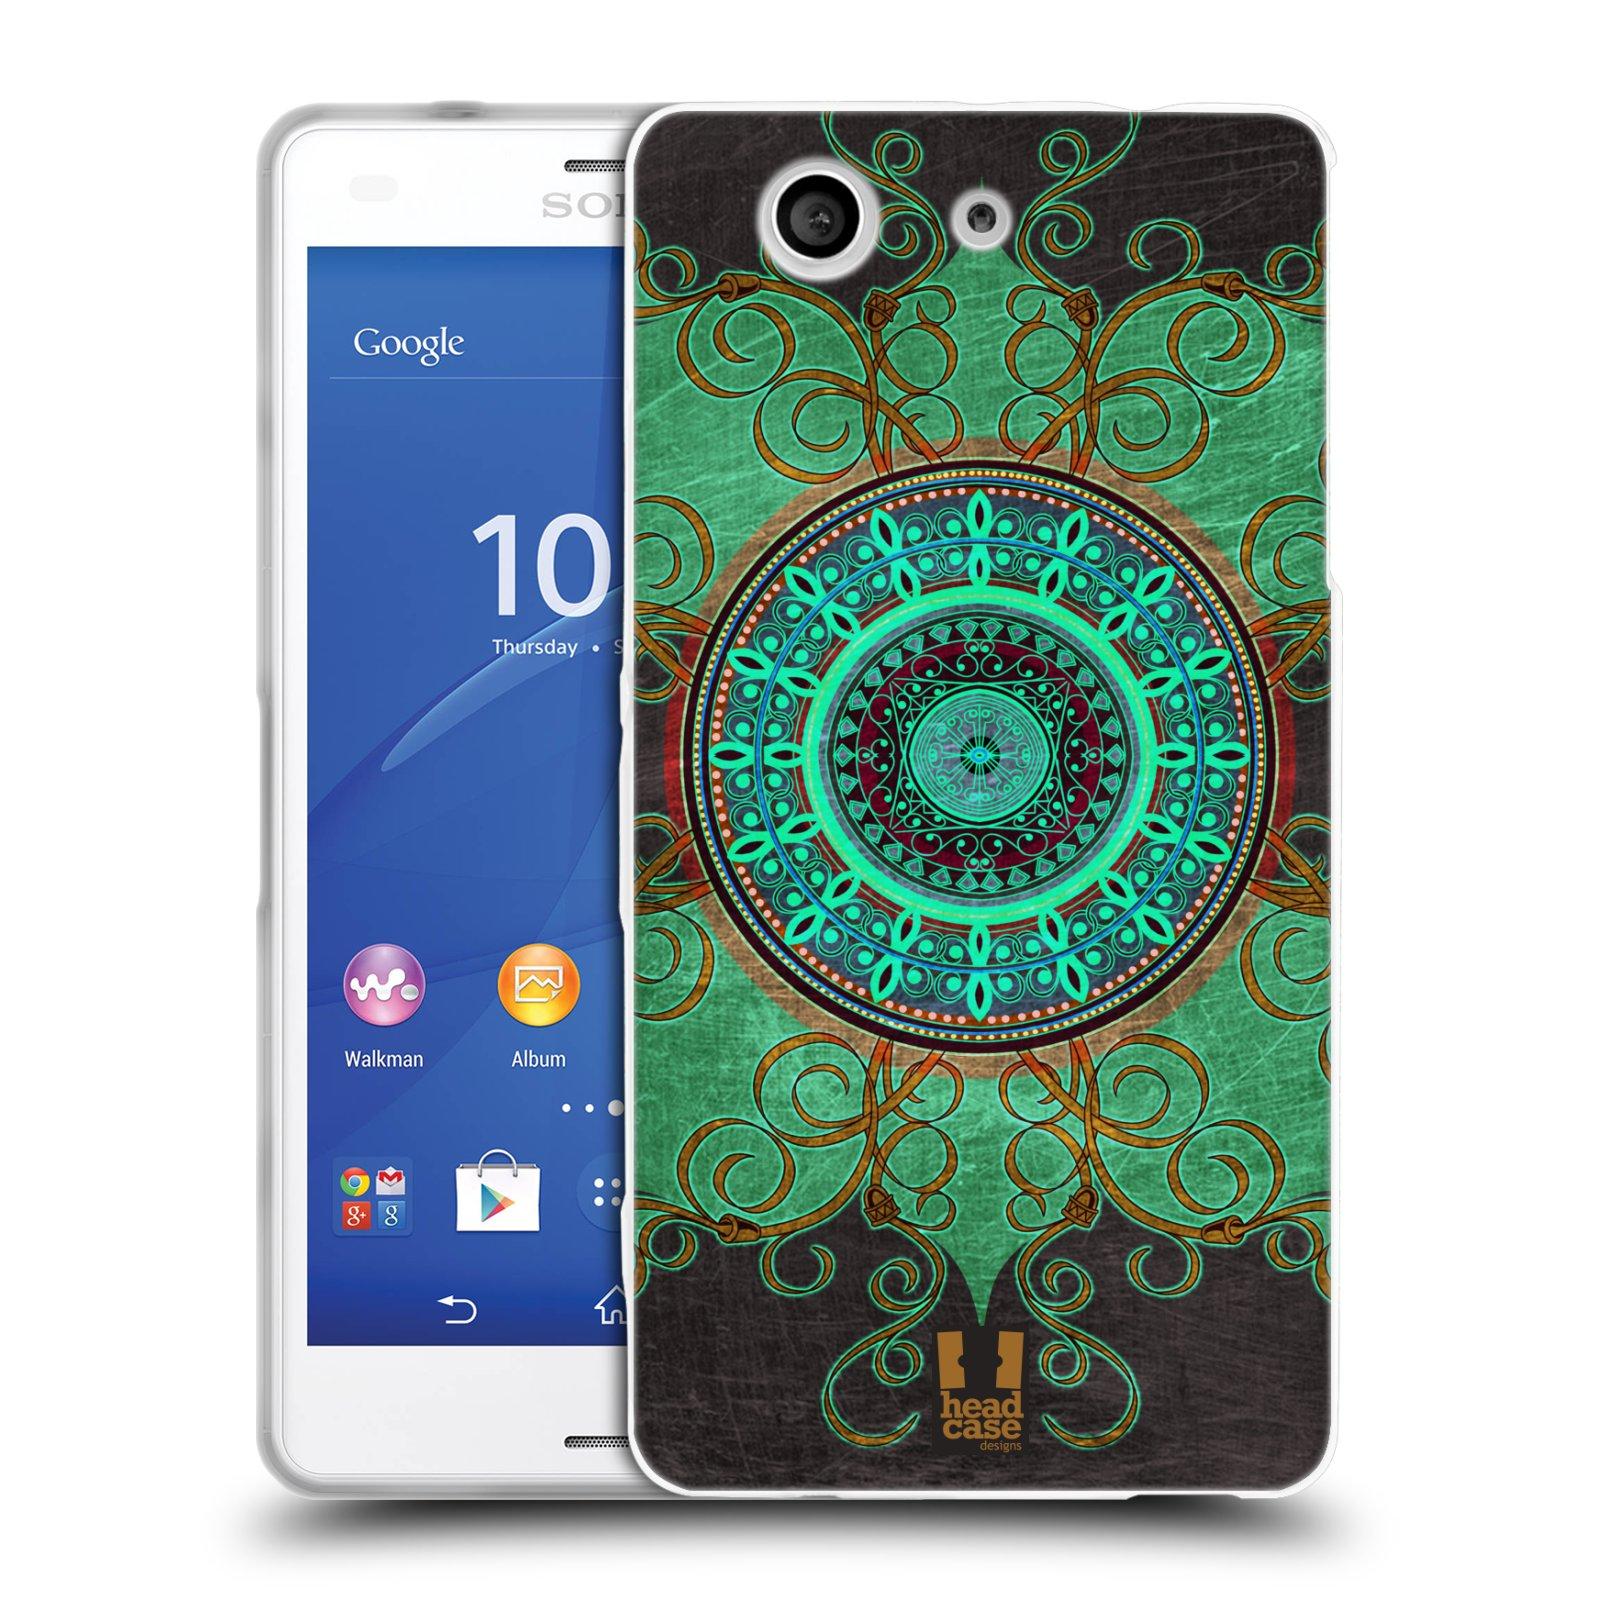 Silikonové pouzdro na mobil Sony Xperia Z3 Compact D5803 HEAD CASE ARAB MANDALA